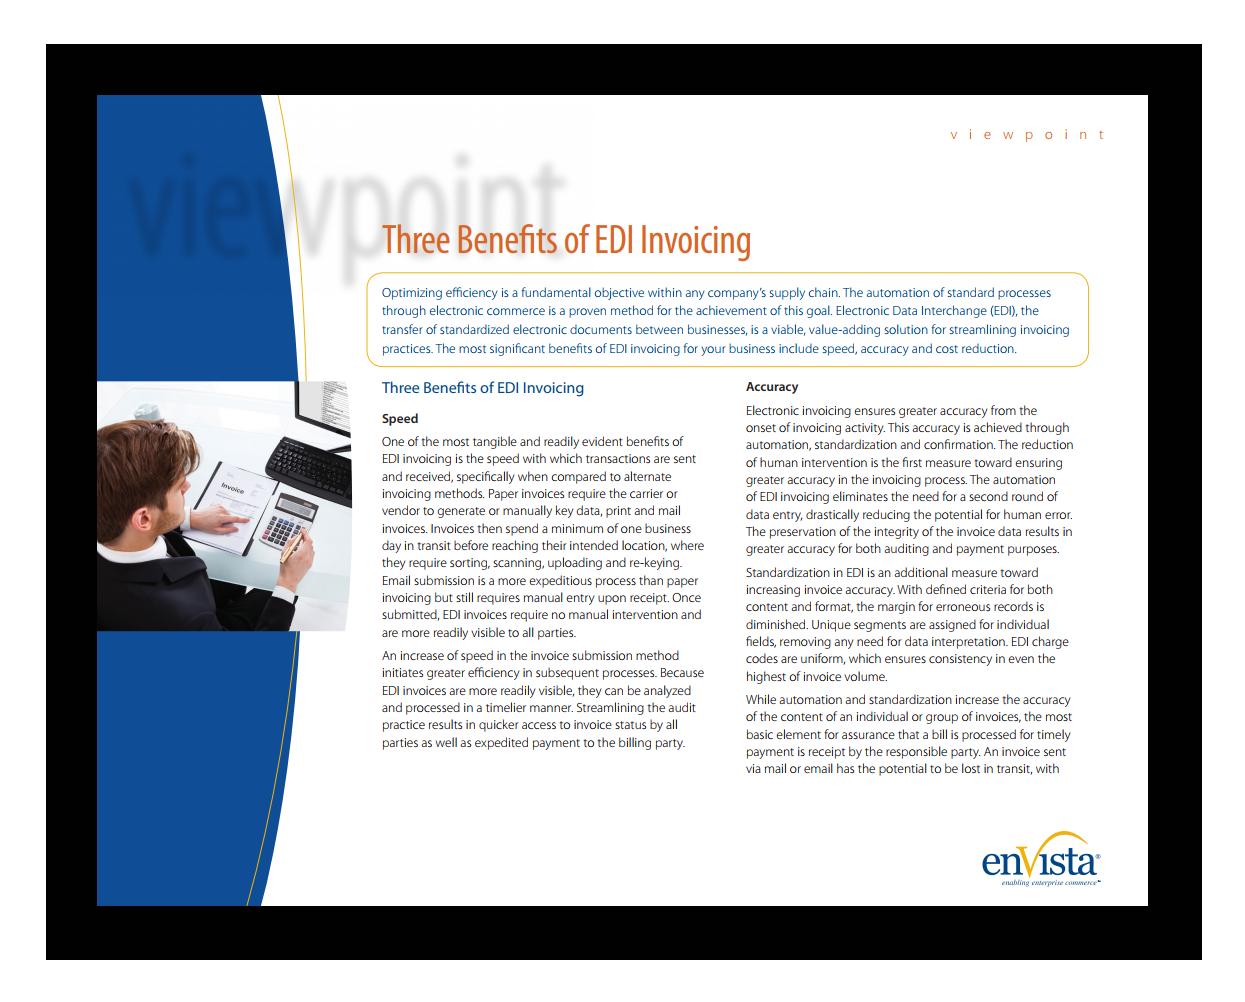 Image_three-benefits-of-edi-invoicing.png